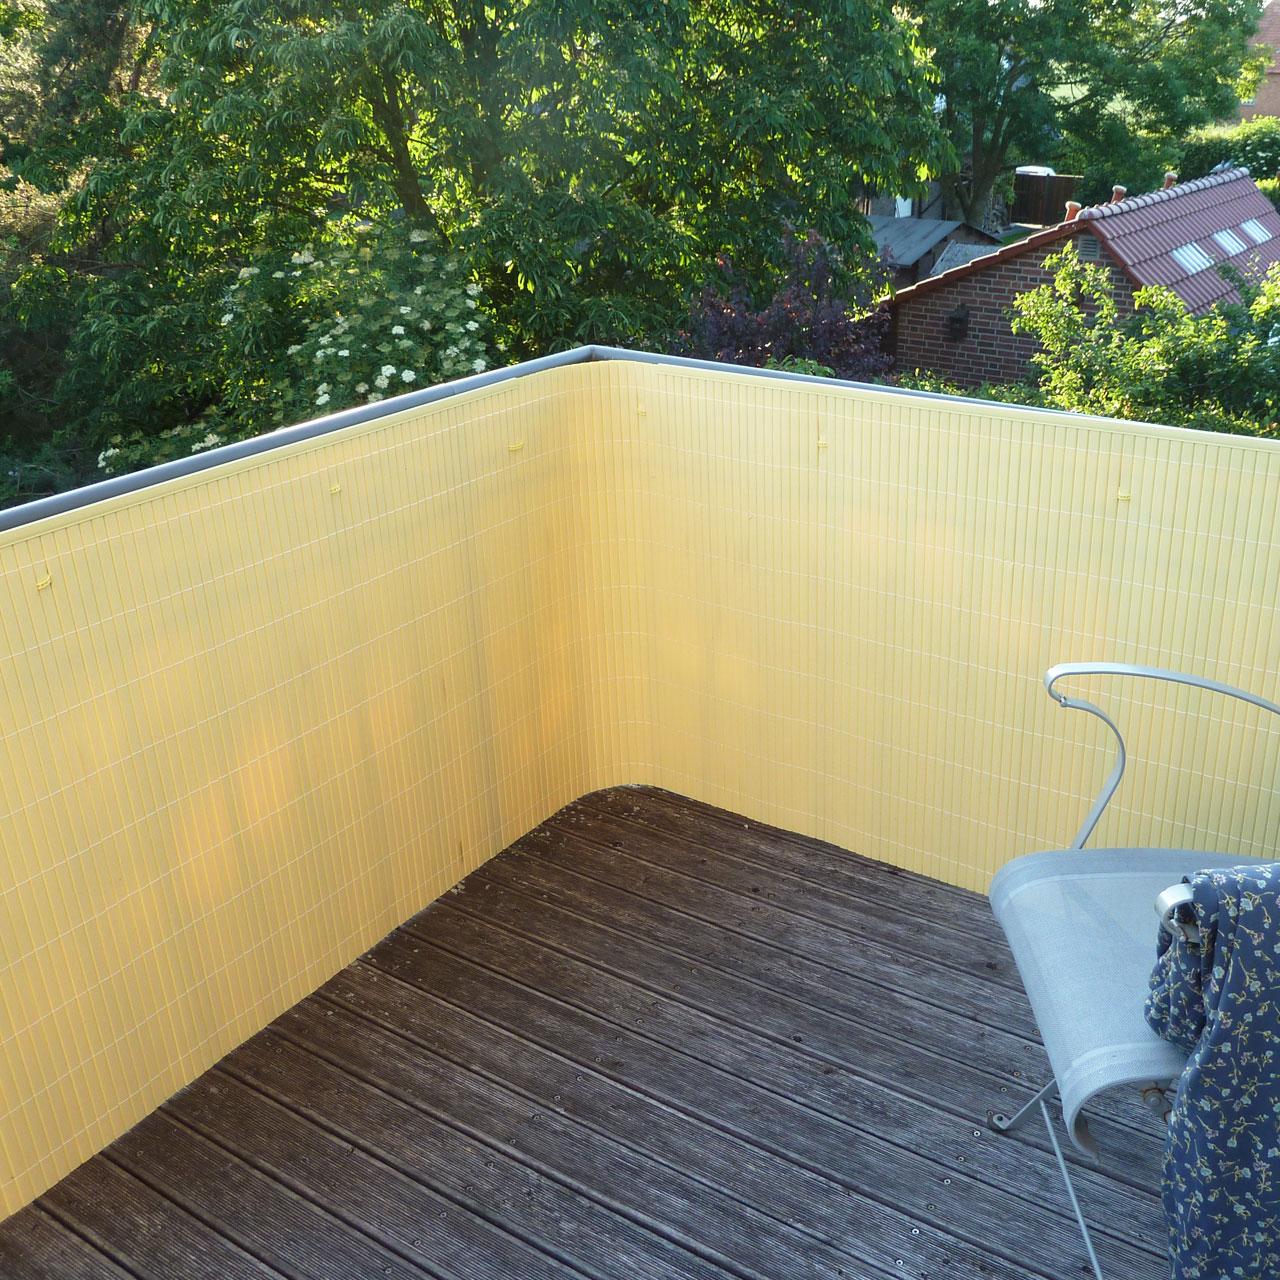 sichtschutzzaun pvc jarolift pvc sichtschutzzaun befestigungsclips sichtschutzmatte pvc. Black Bedroom Furniture Sets. Home Design Ideas